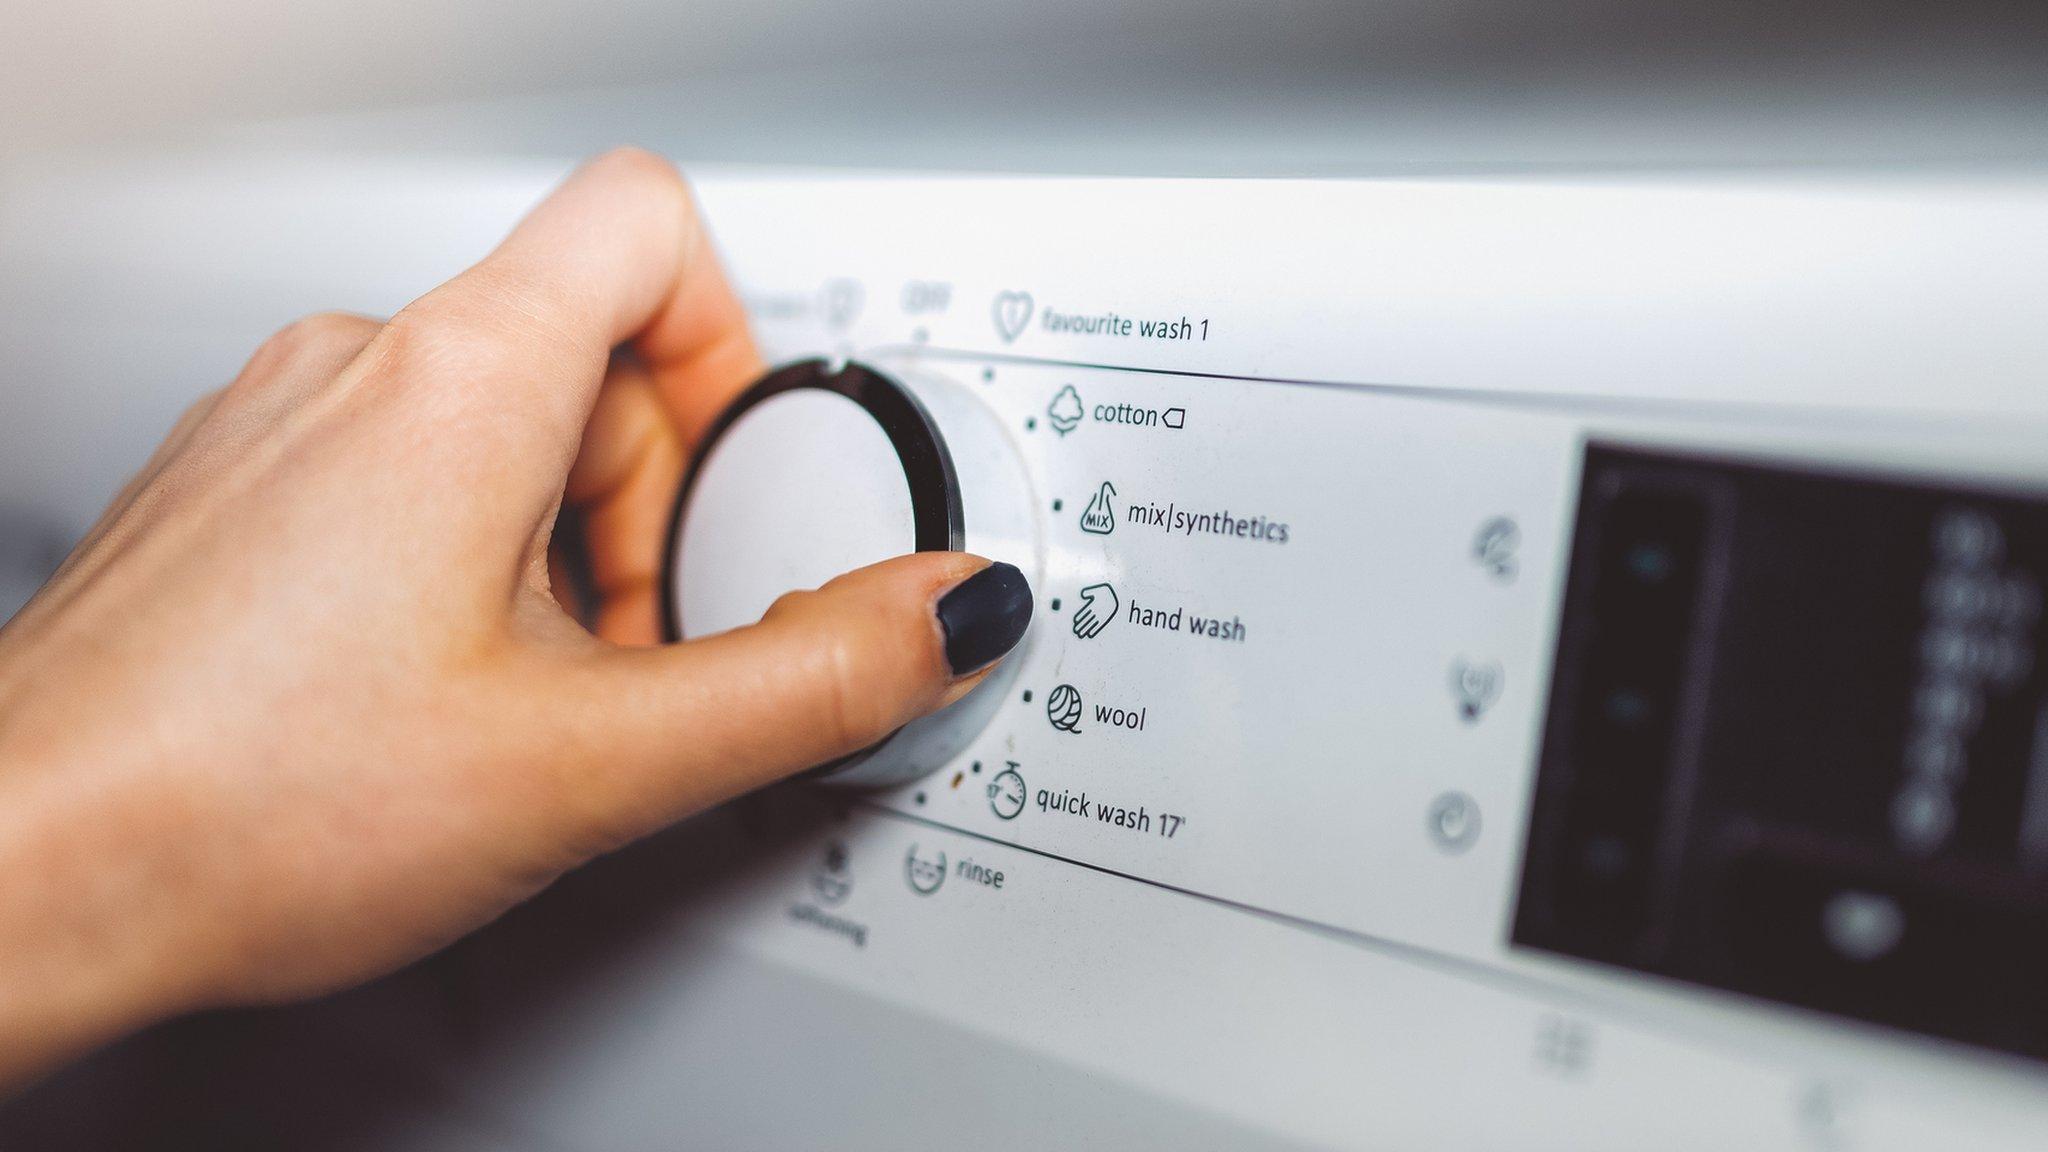 hand on washing machine controls